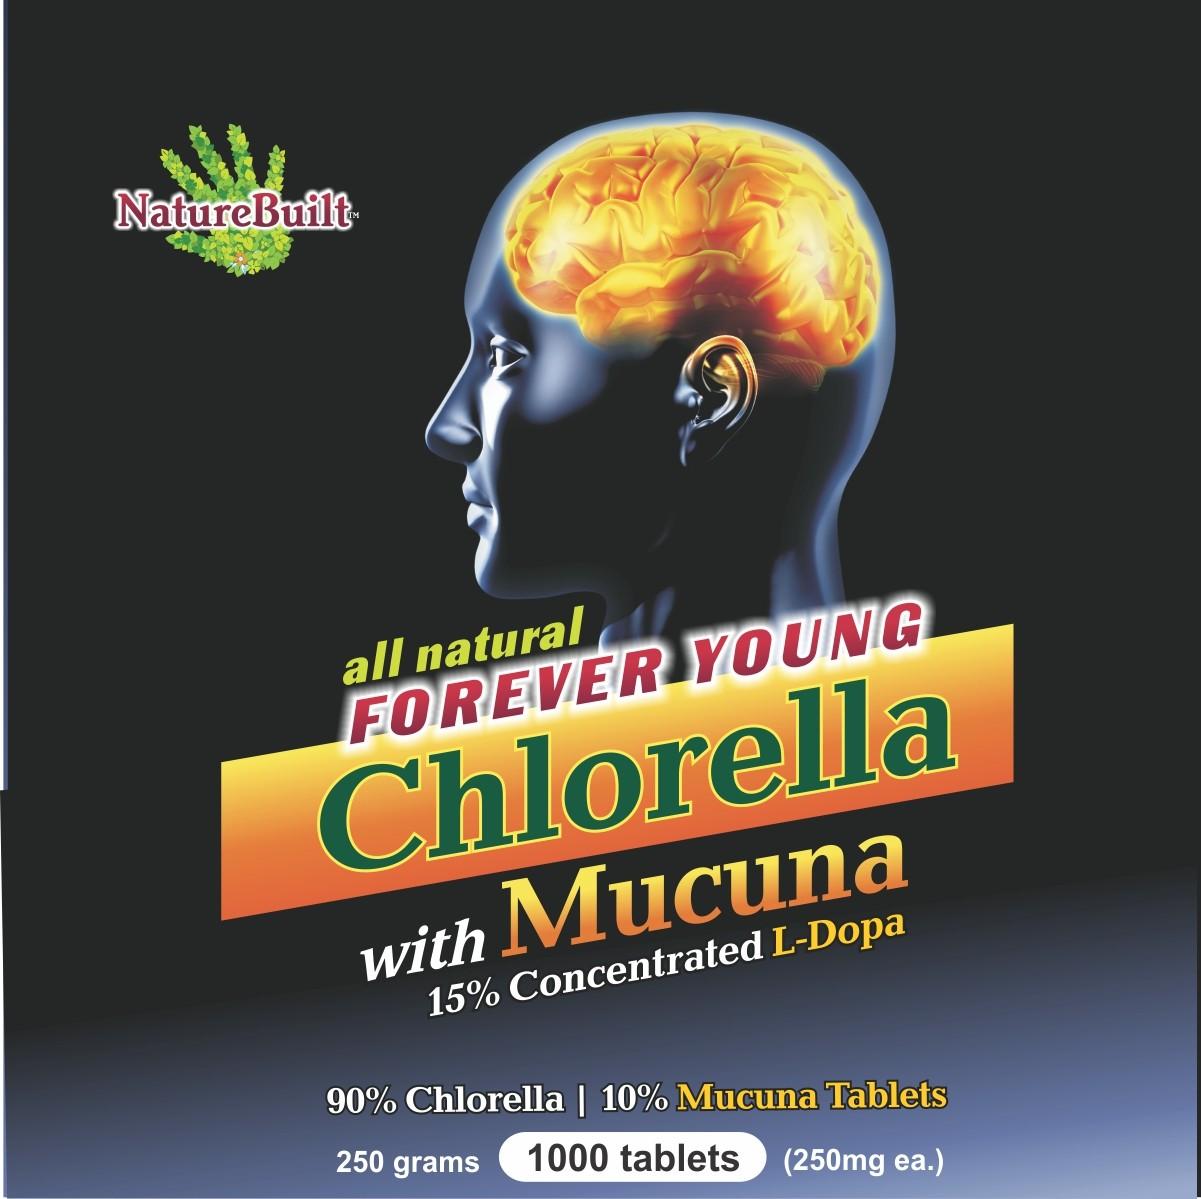 90% Chlorella 10% Mucuna Tablets